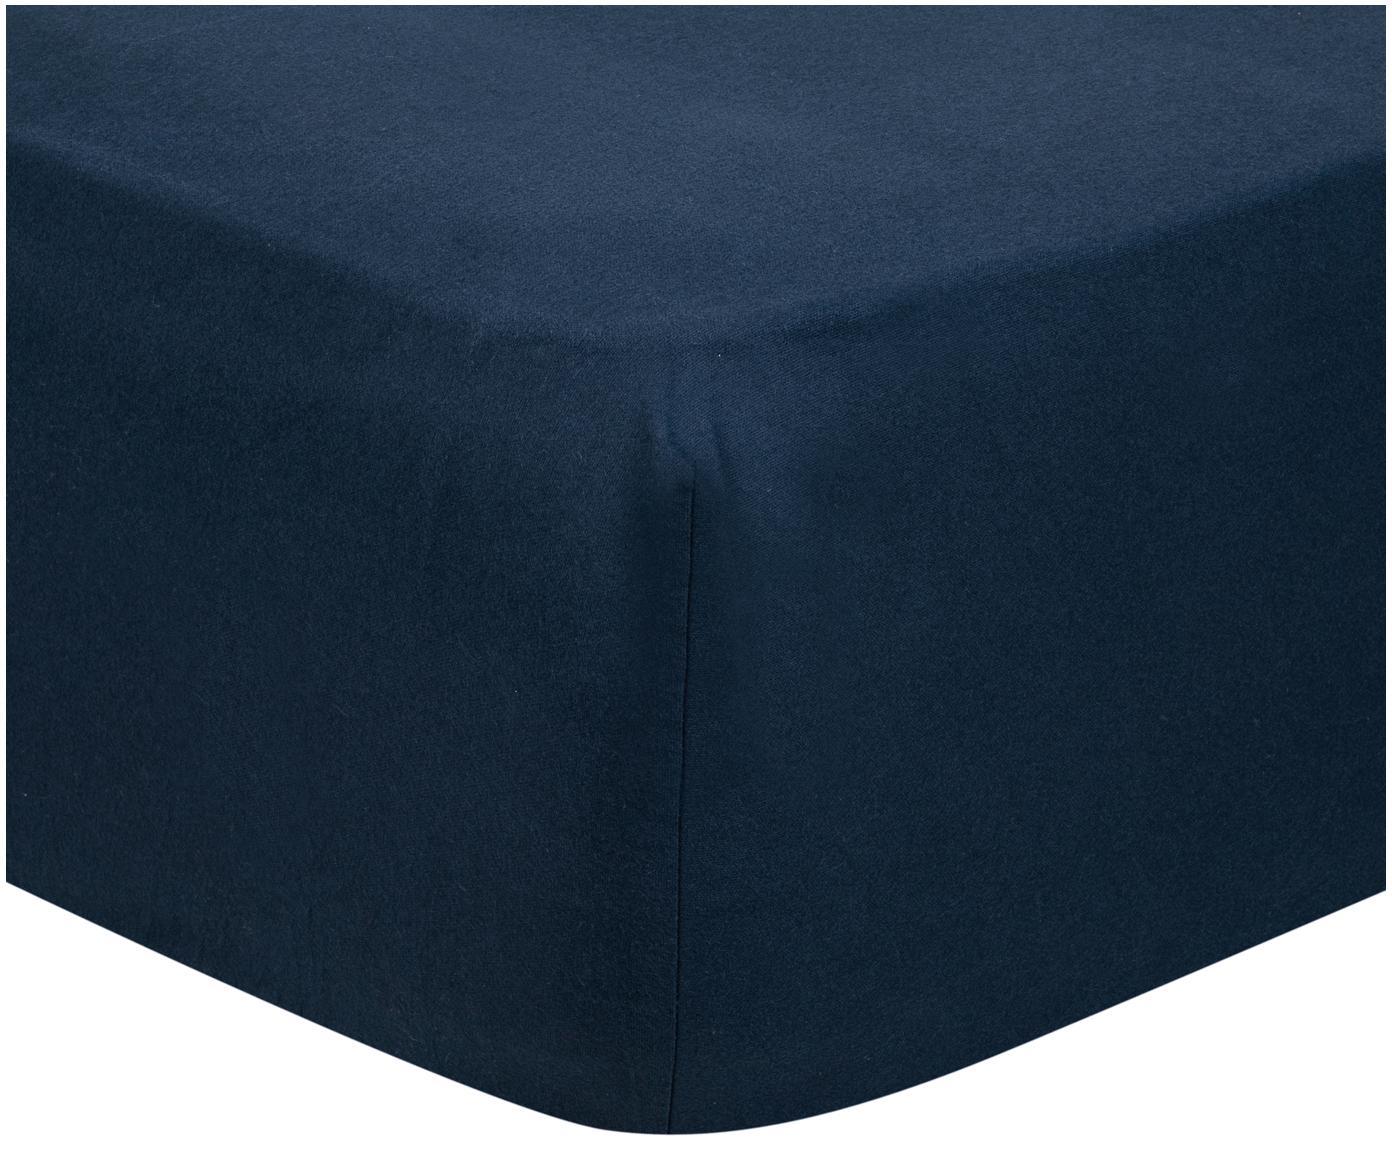 Lenzuolo con angoli in flanella Biba, Tessuto: flanella, Blu navy, Larg. 90 x Lung. 200 cm